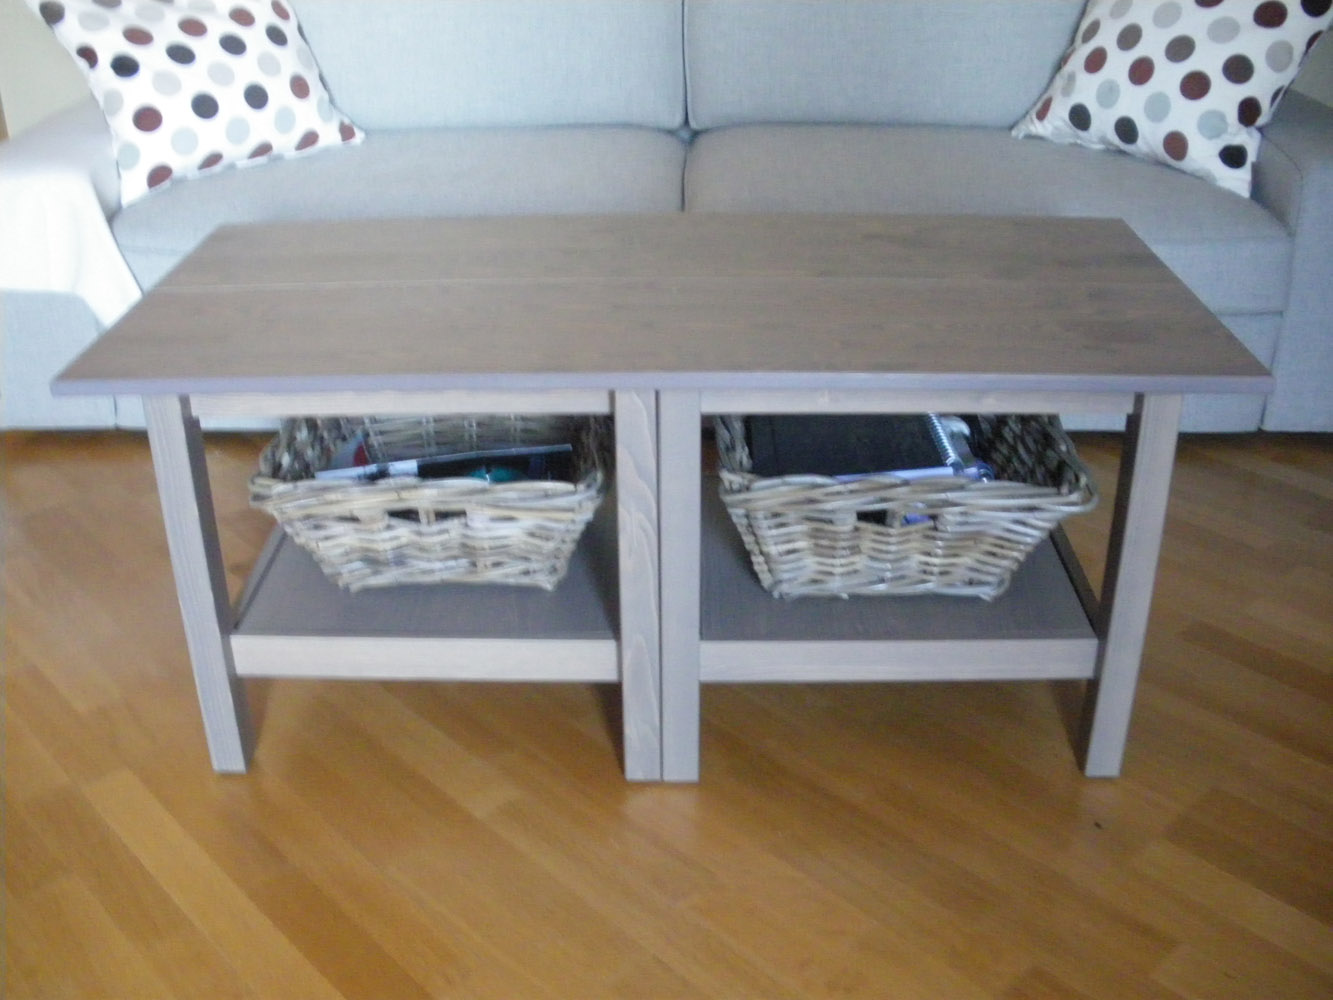 Ikea hack la mesa de centro hemnes con baldas ekby como for Mesas de centro salon ikea